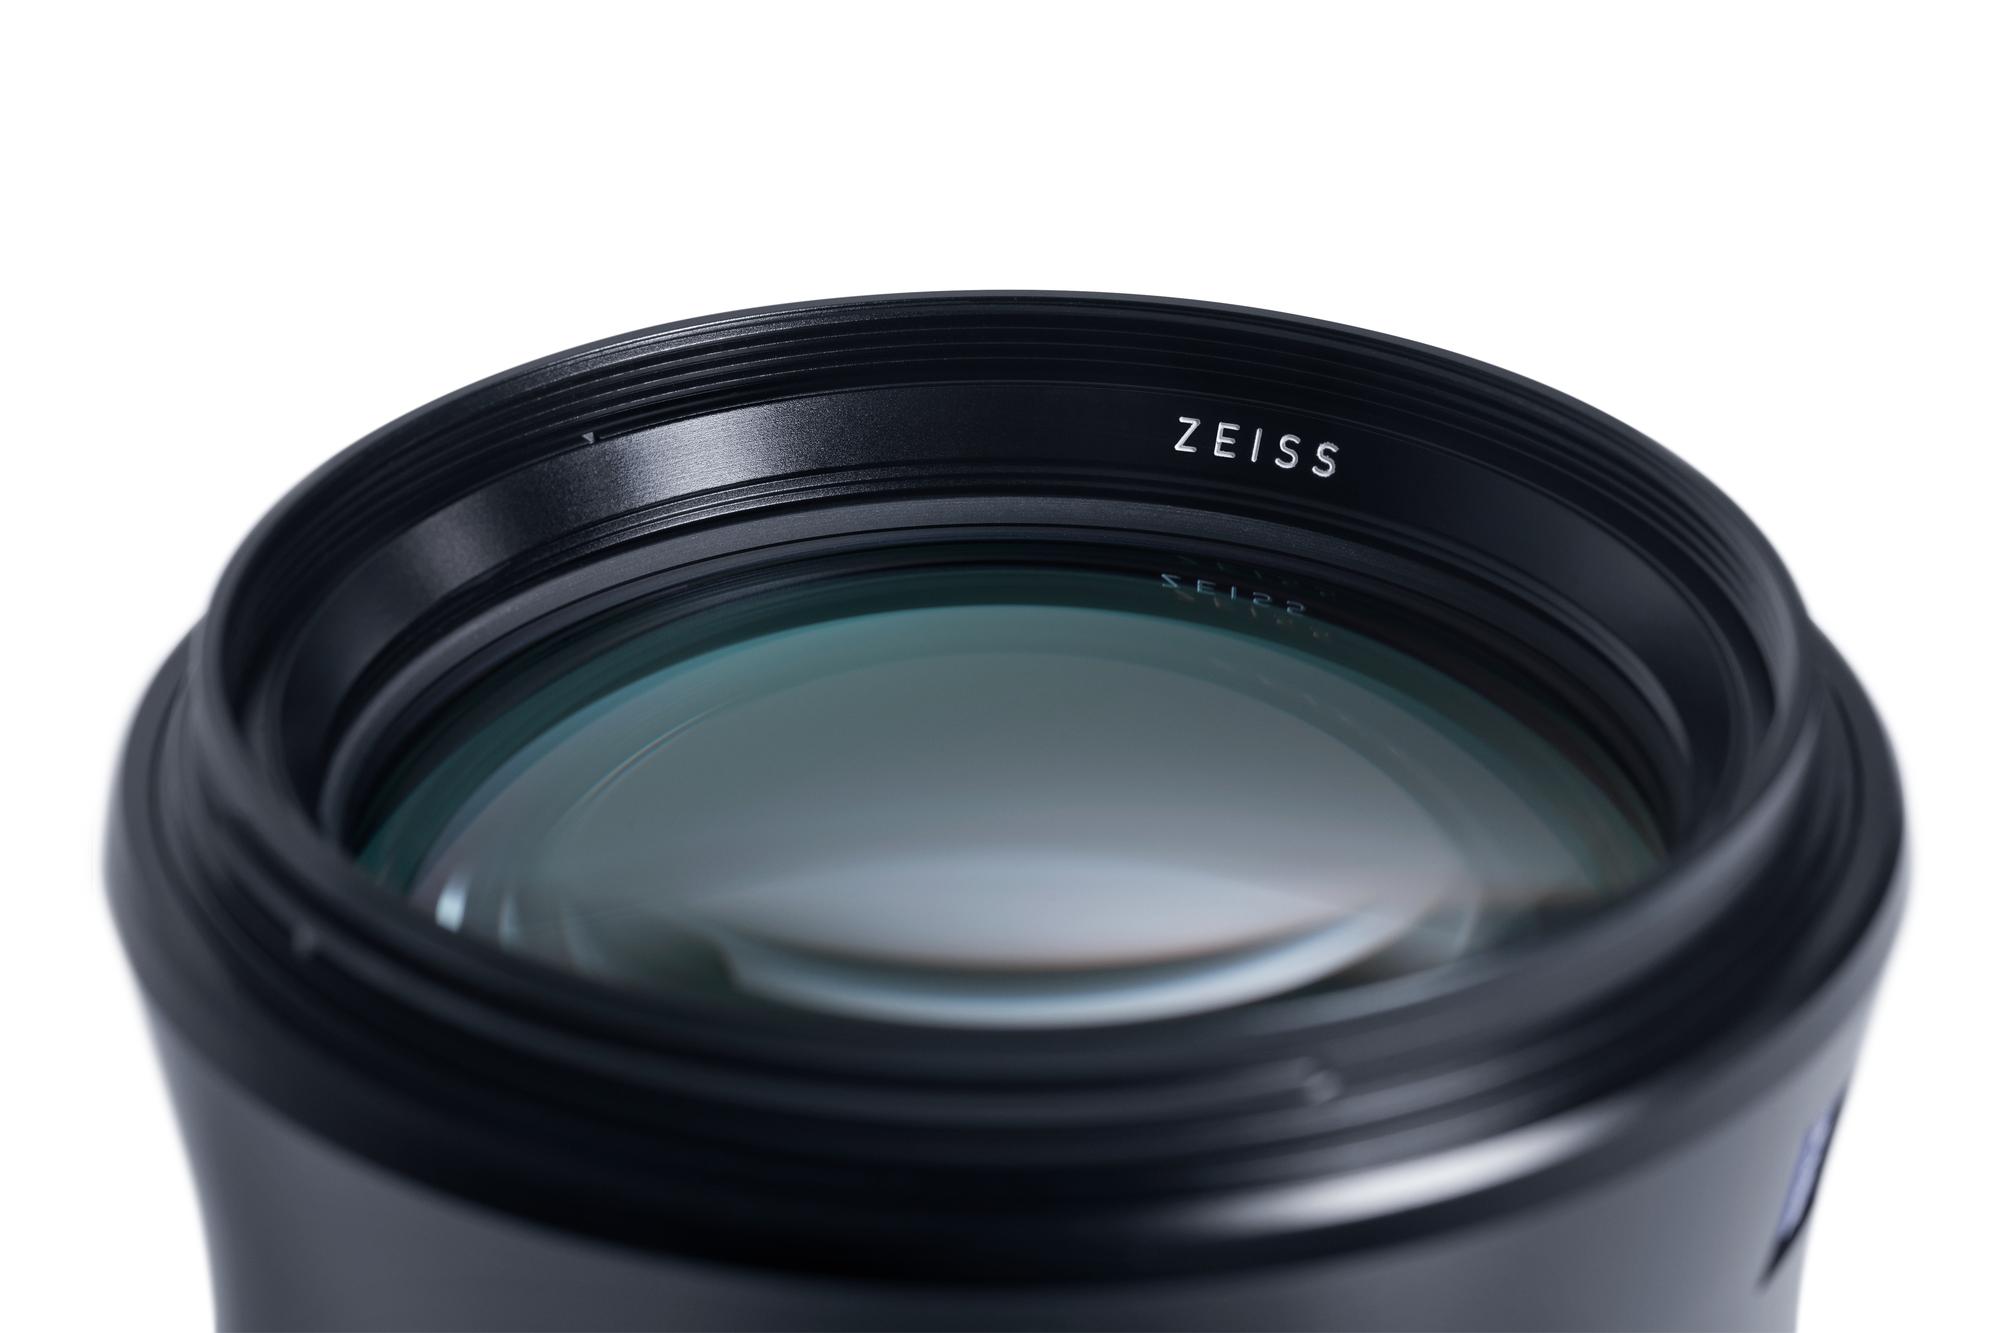 zeiss otus 1.4 100mm lens